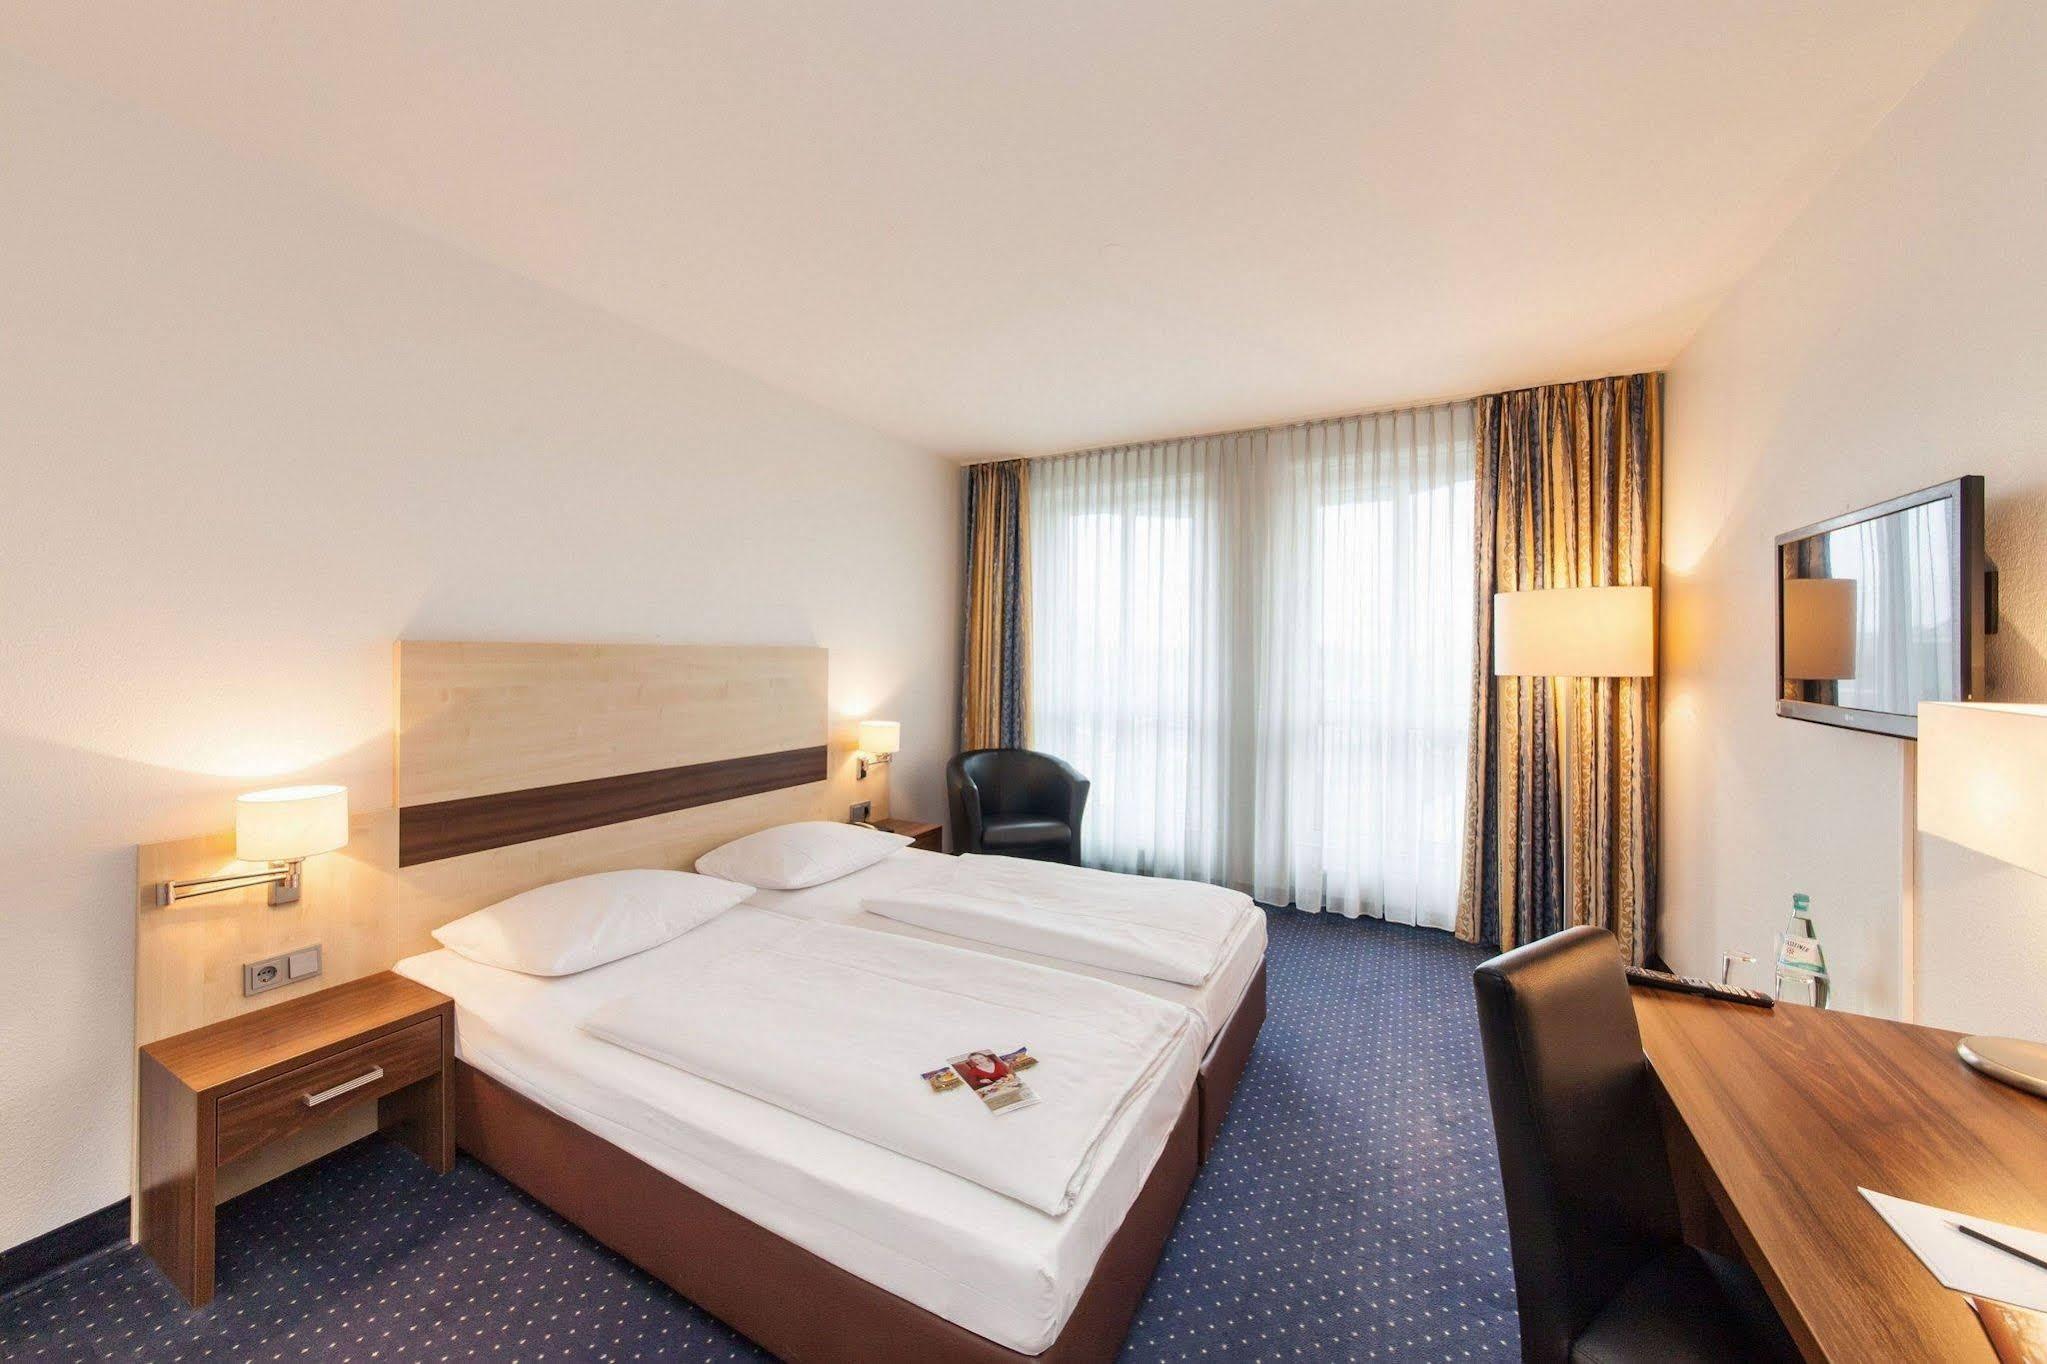 Mercure Hotel Koeln Airport